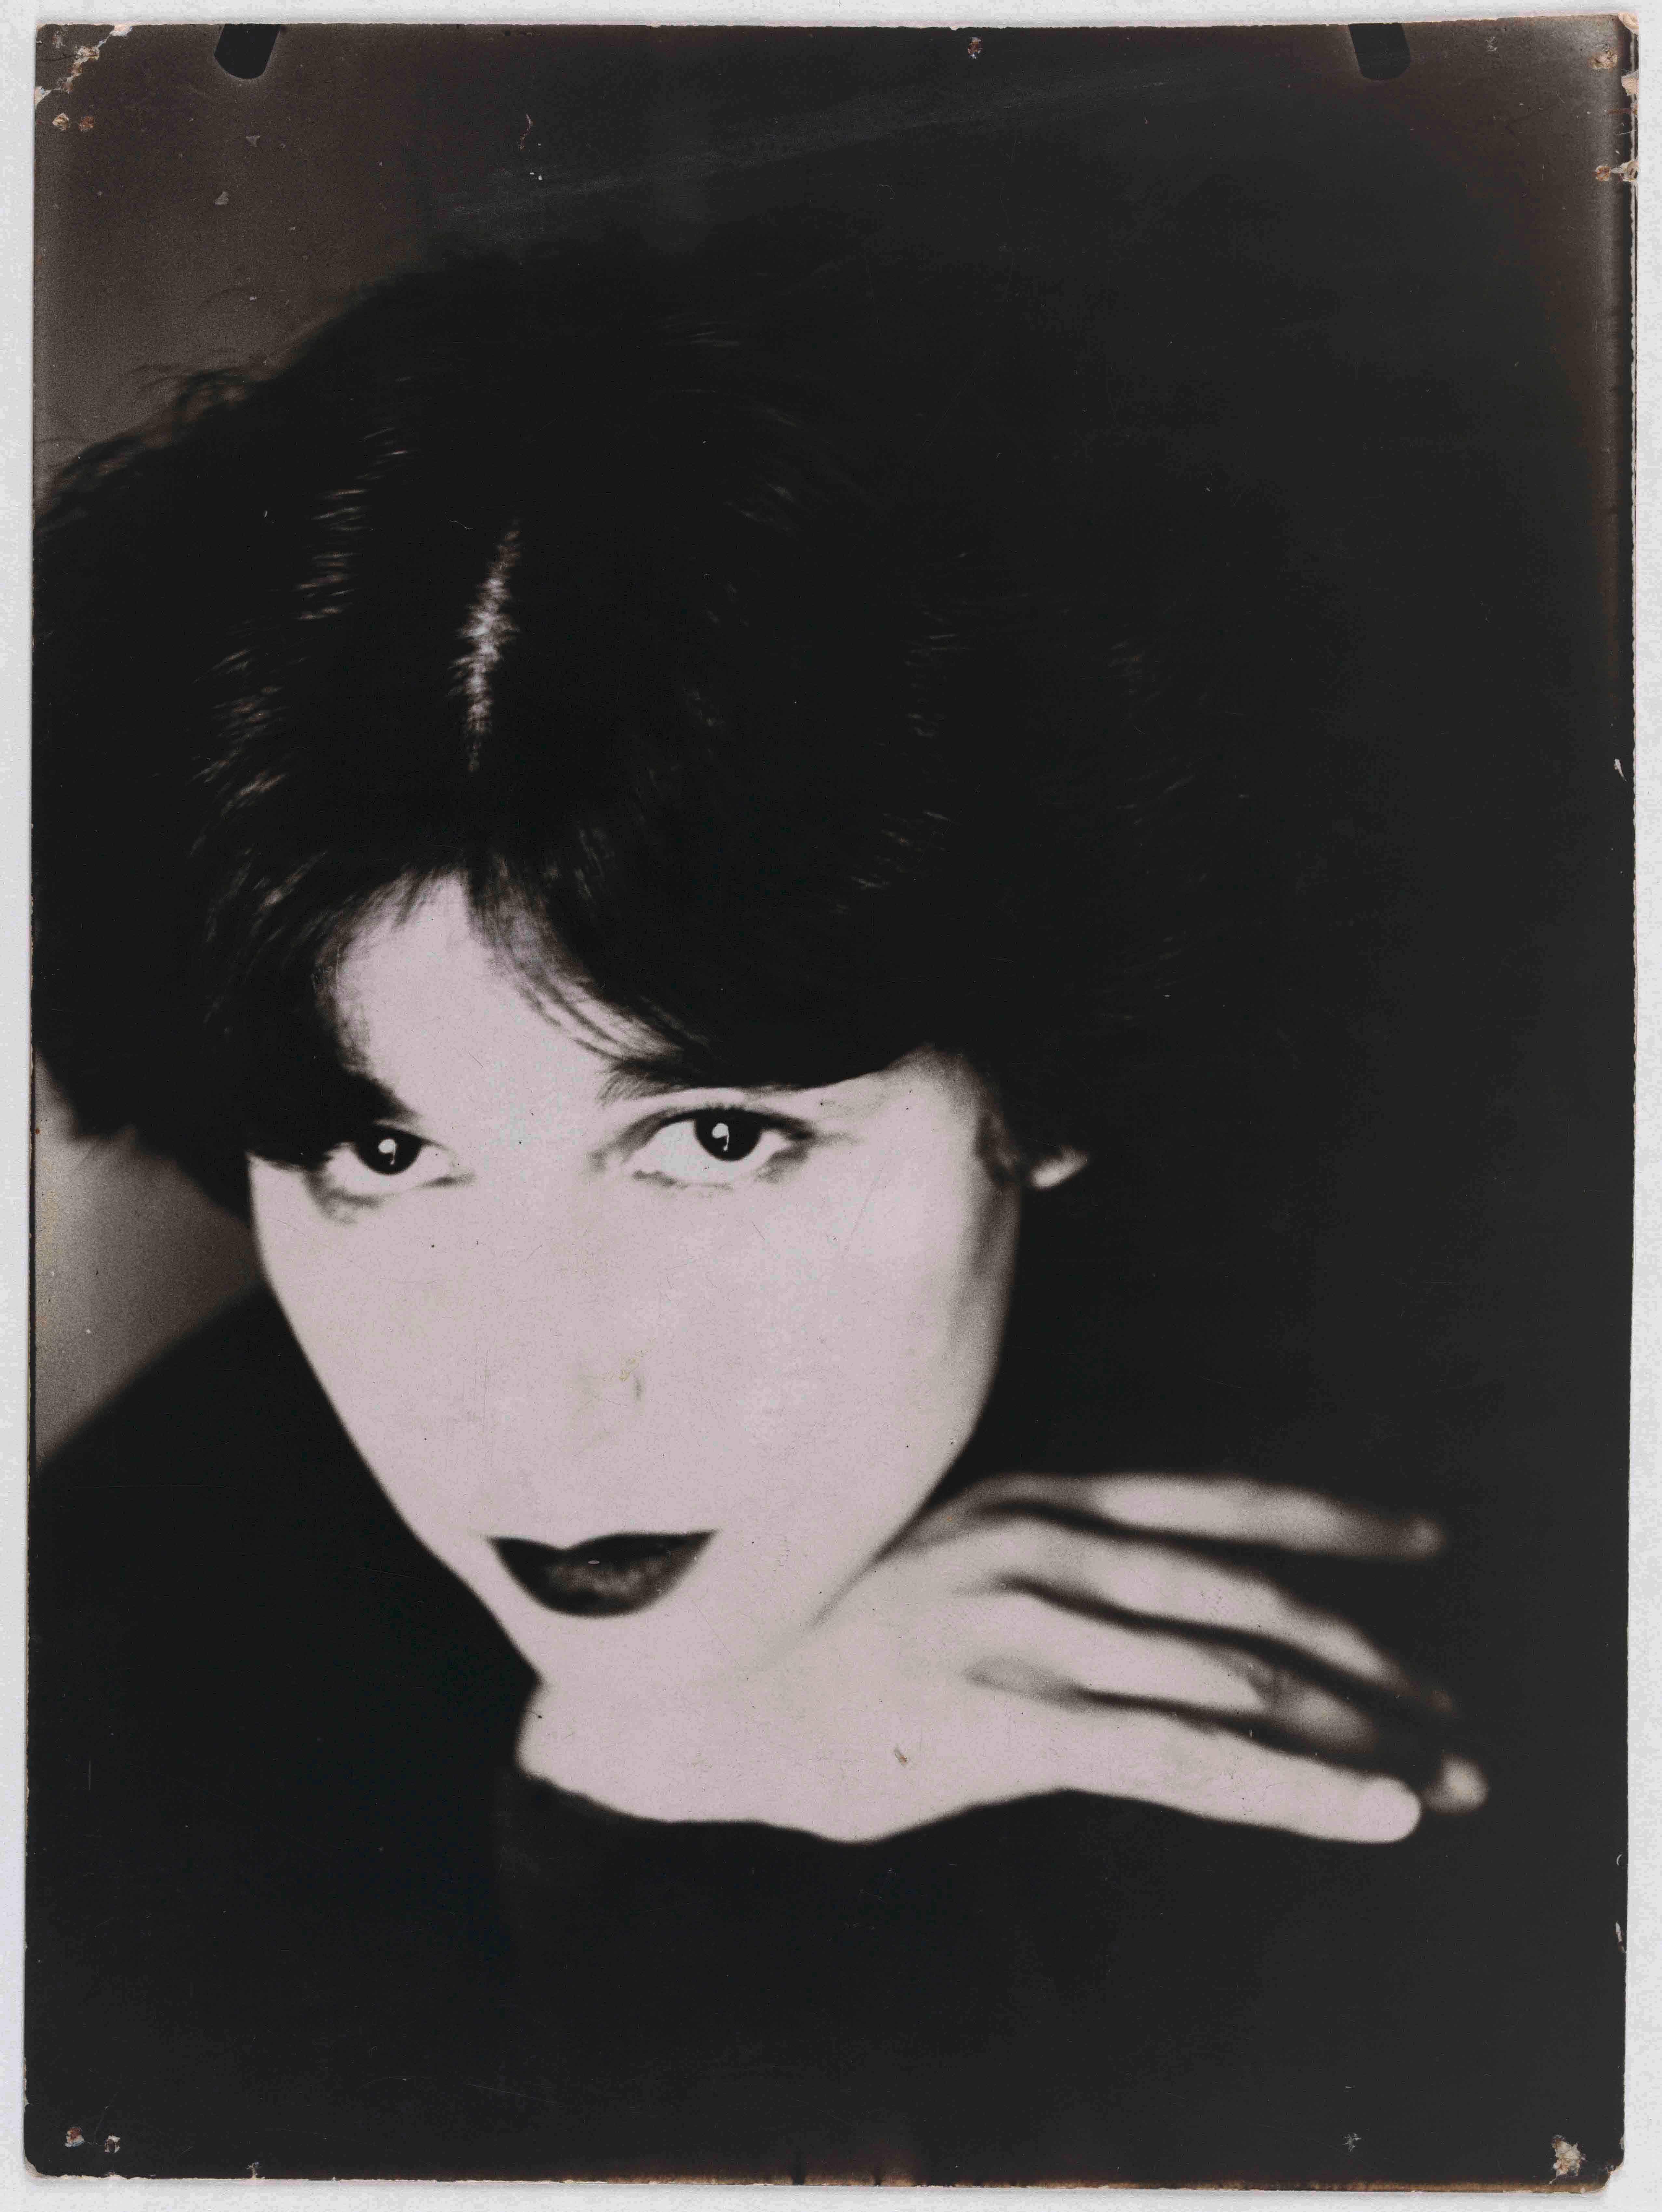 Umbo, Untitled (Ruth. The Hand), c. 1926